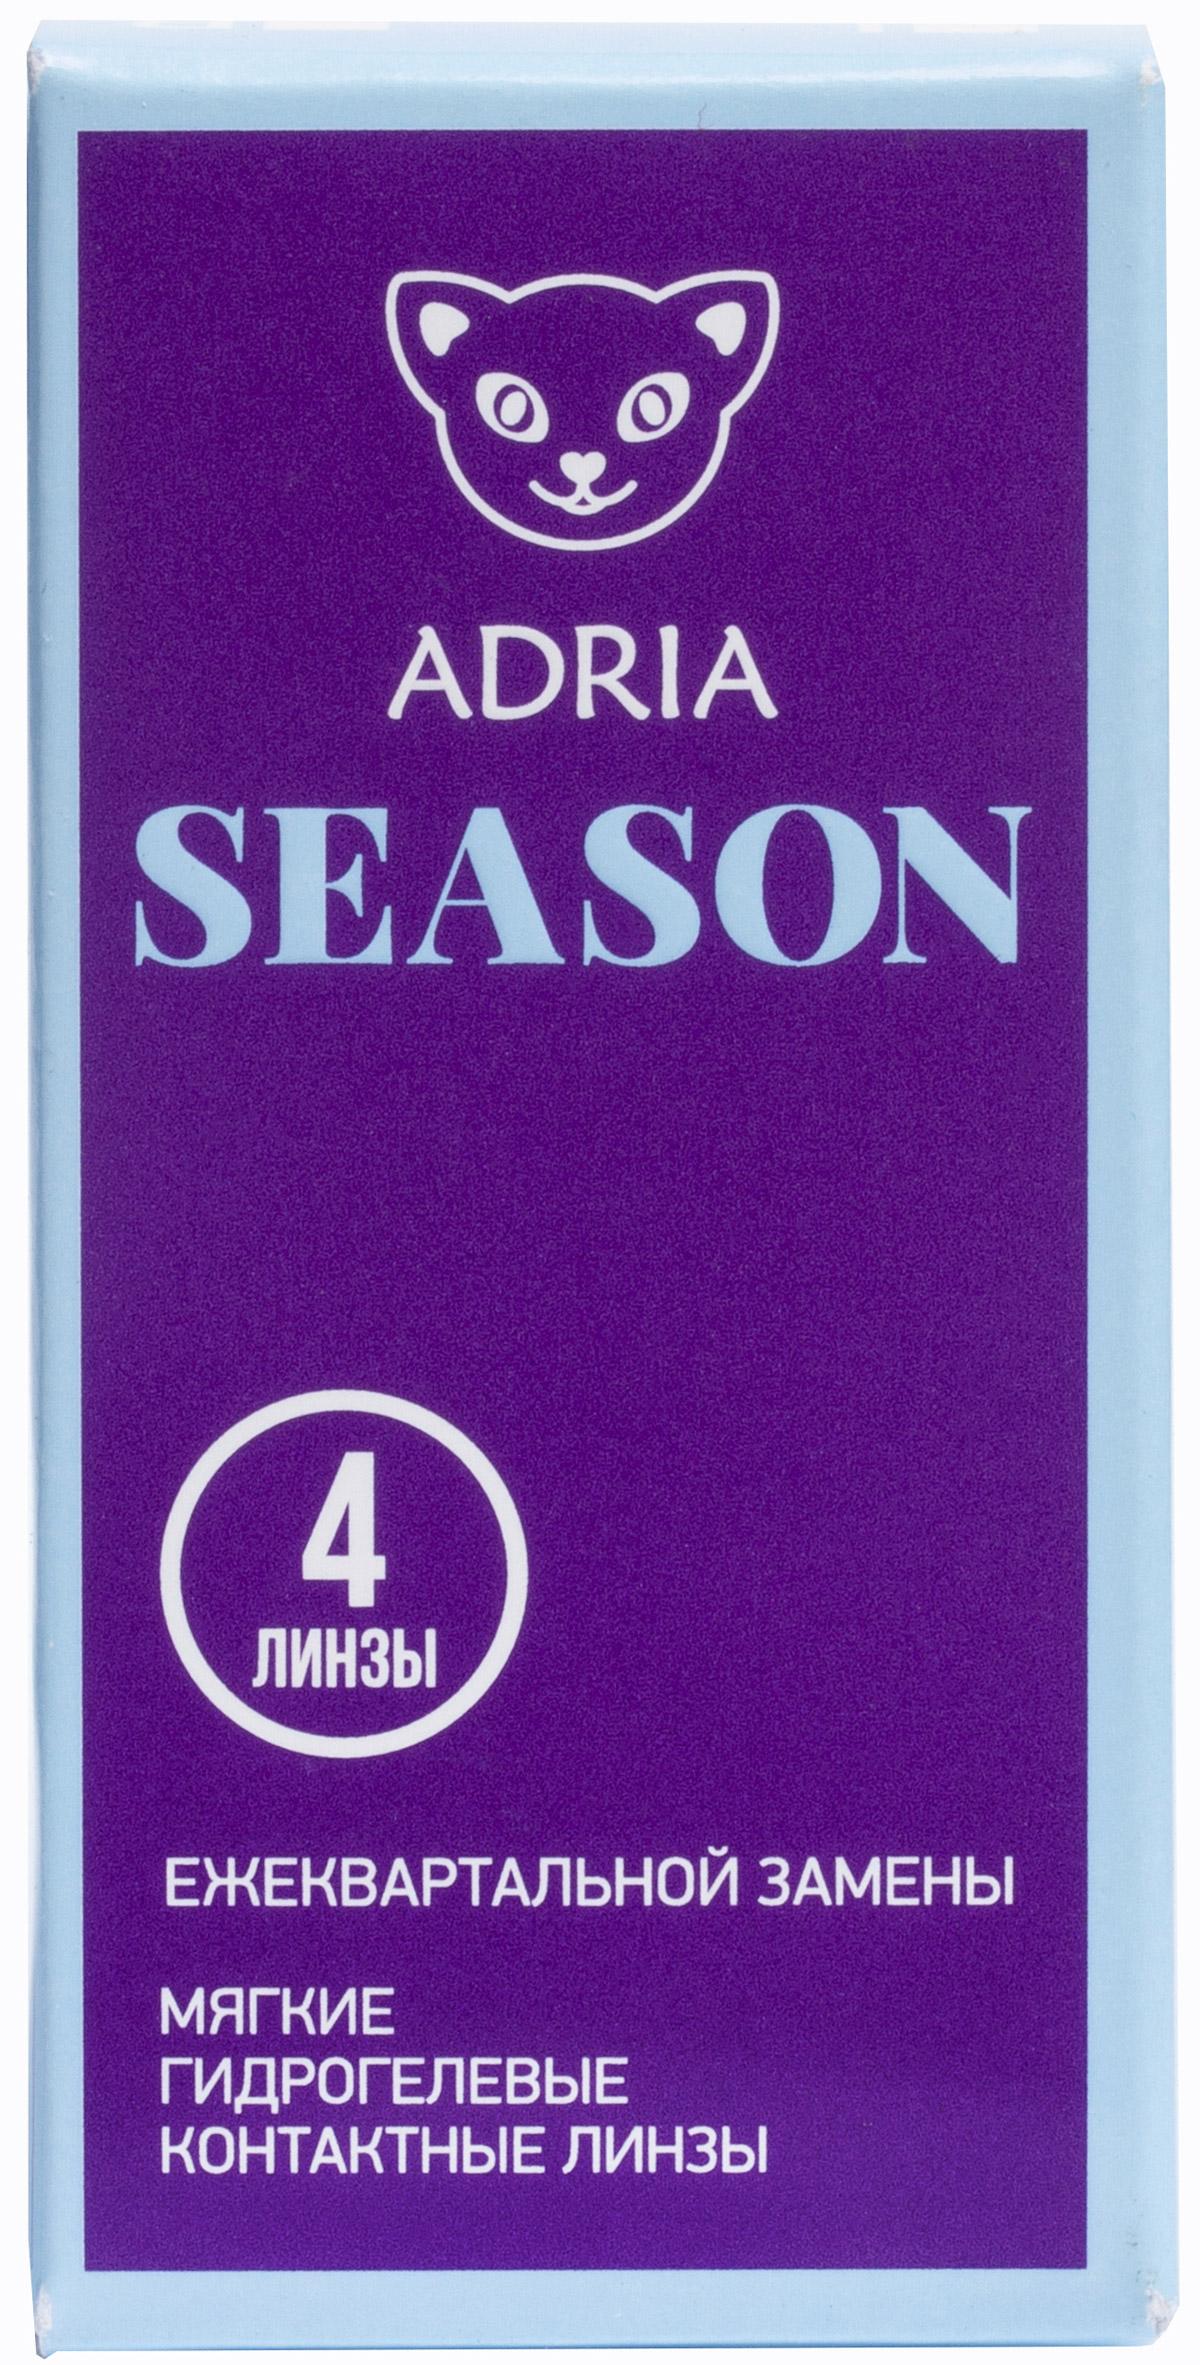 Контактные линзы Adria Season 4 линзы Interojo